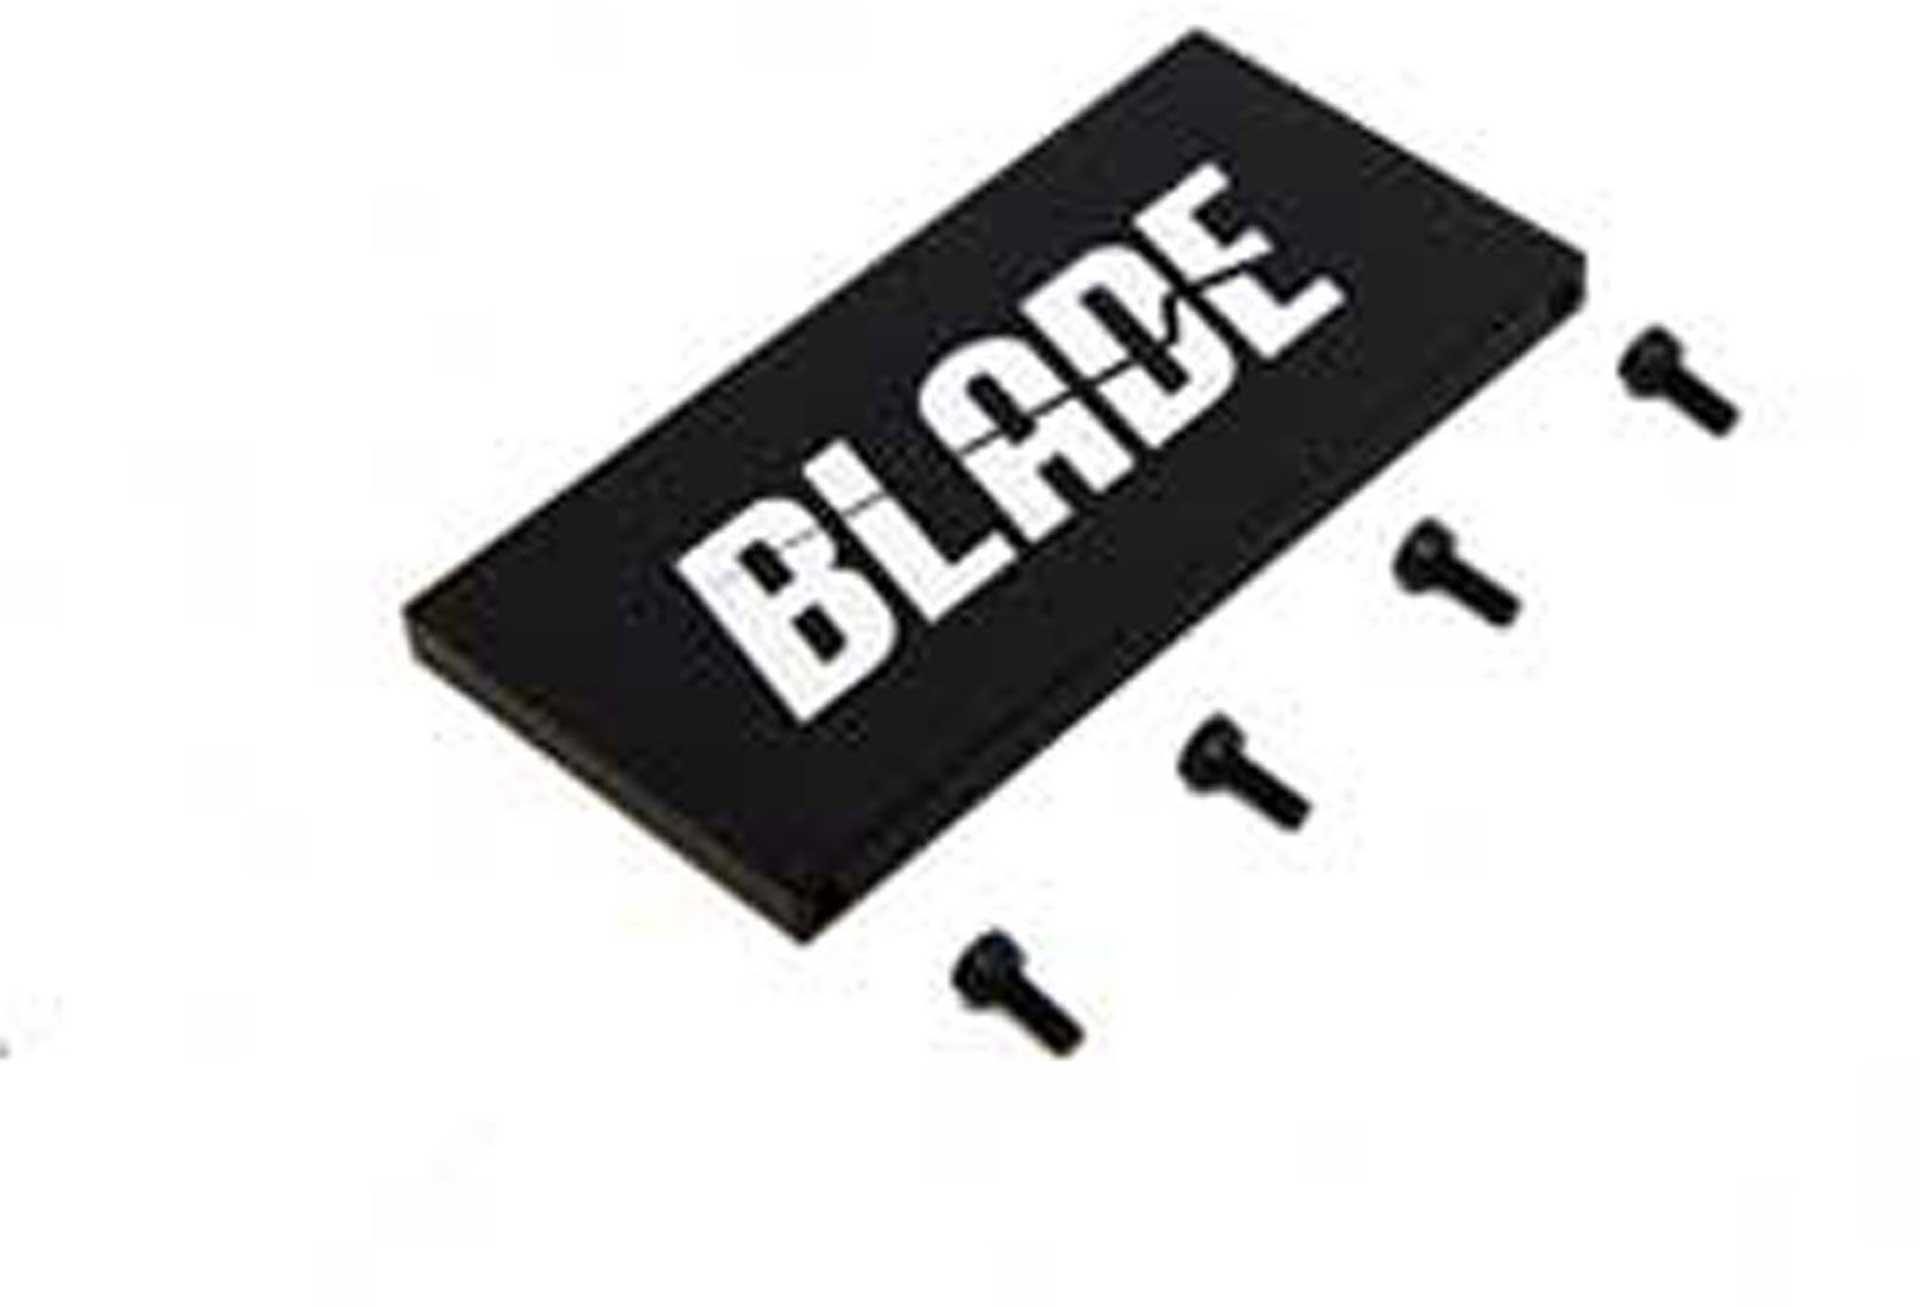 BLADE (E-FLITE) BATTERY TRAY FUSION 270